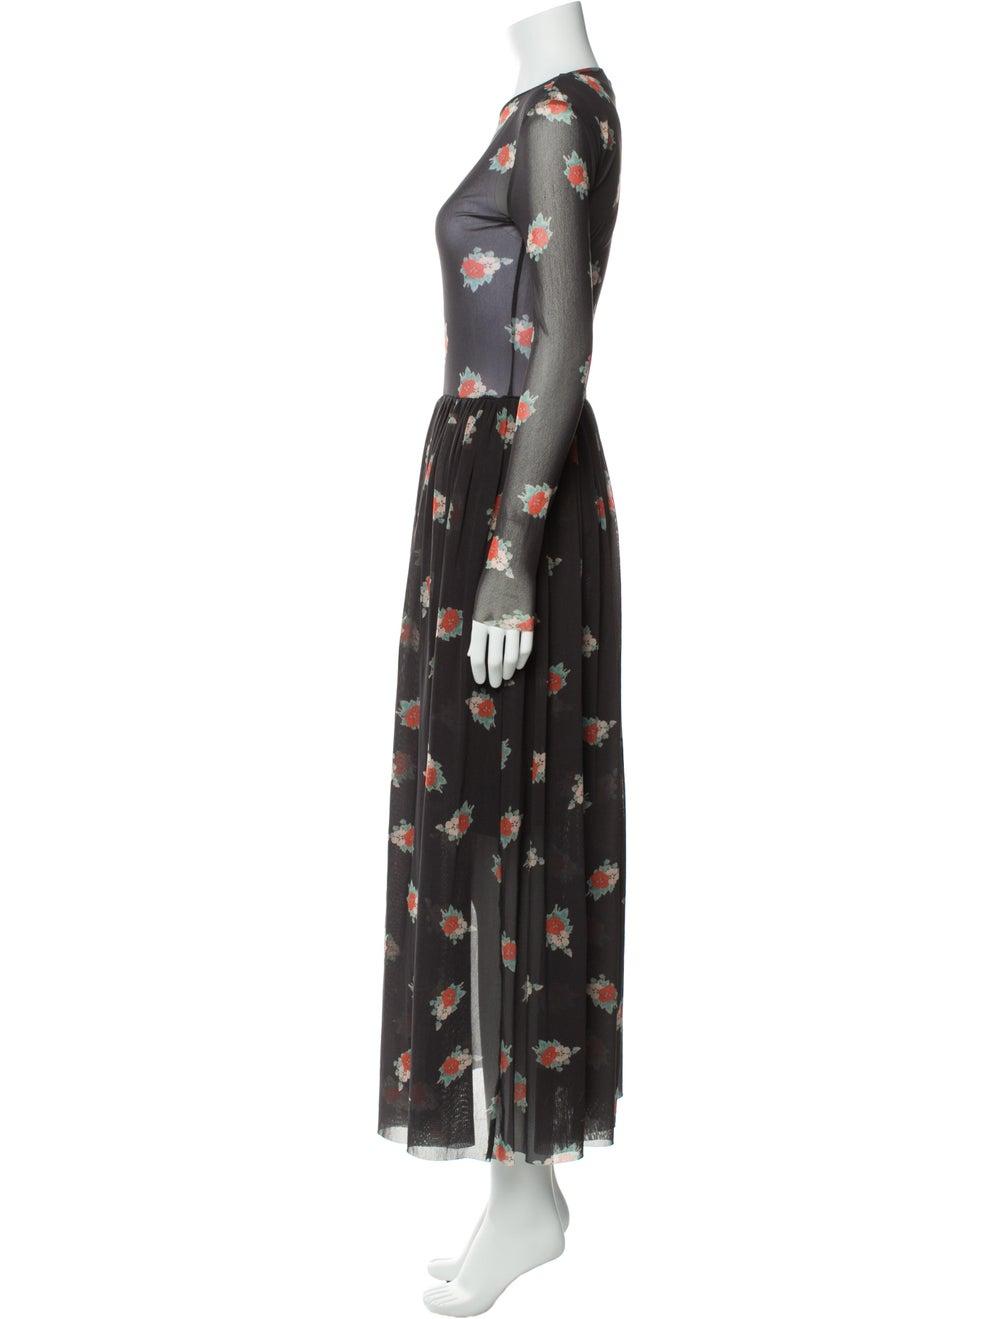 Ganni Floral Print Long Dress Grey - image 2